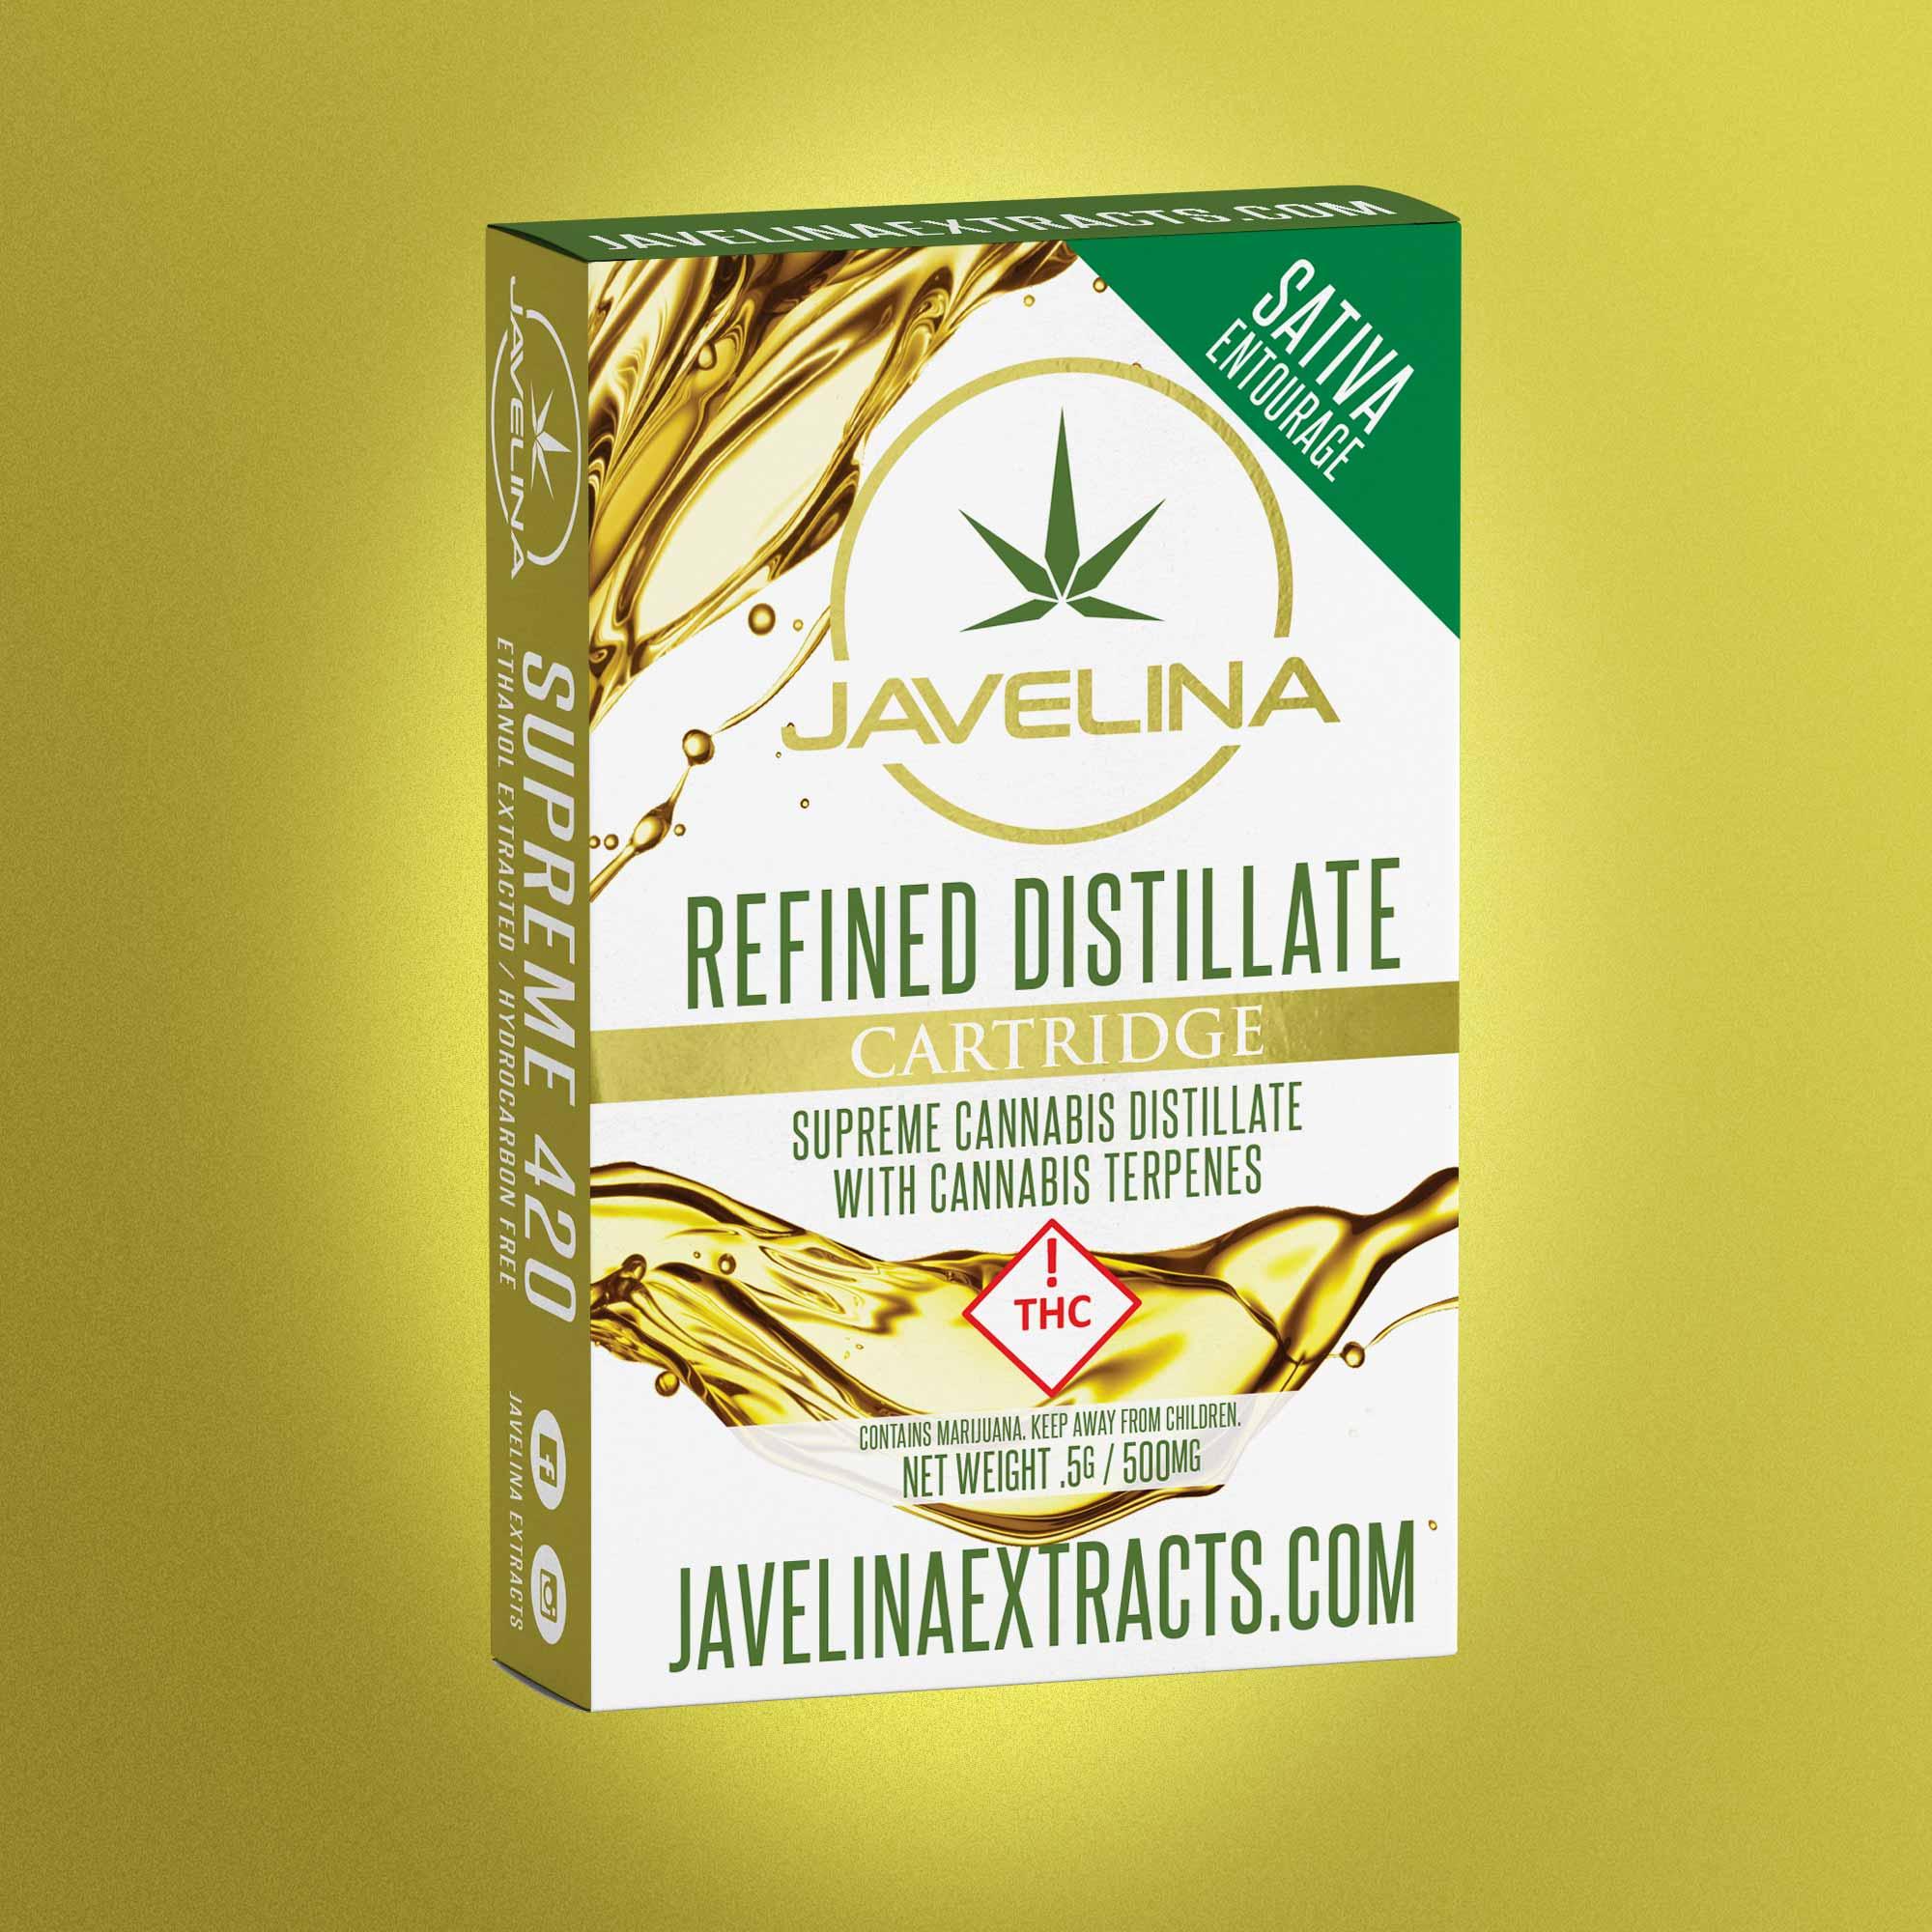 500mg Javelina Cartridge Sativa — JAVELINA EXTRACTS